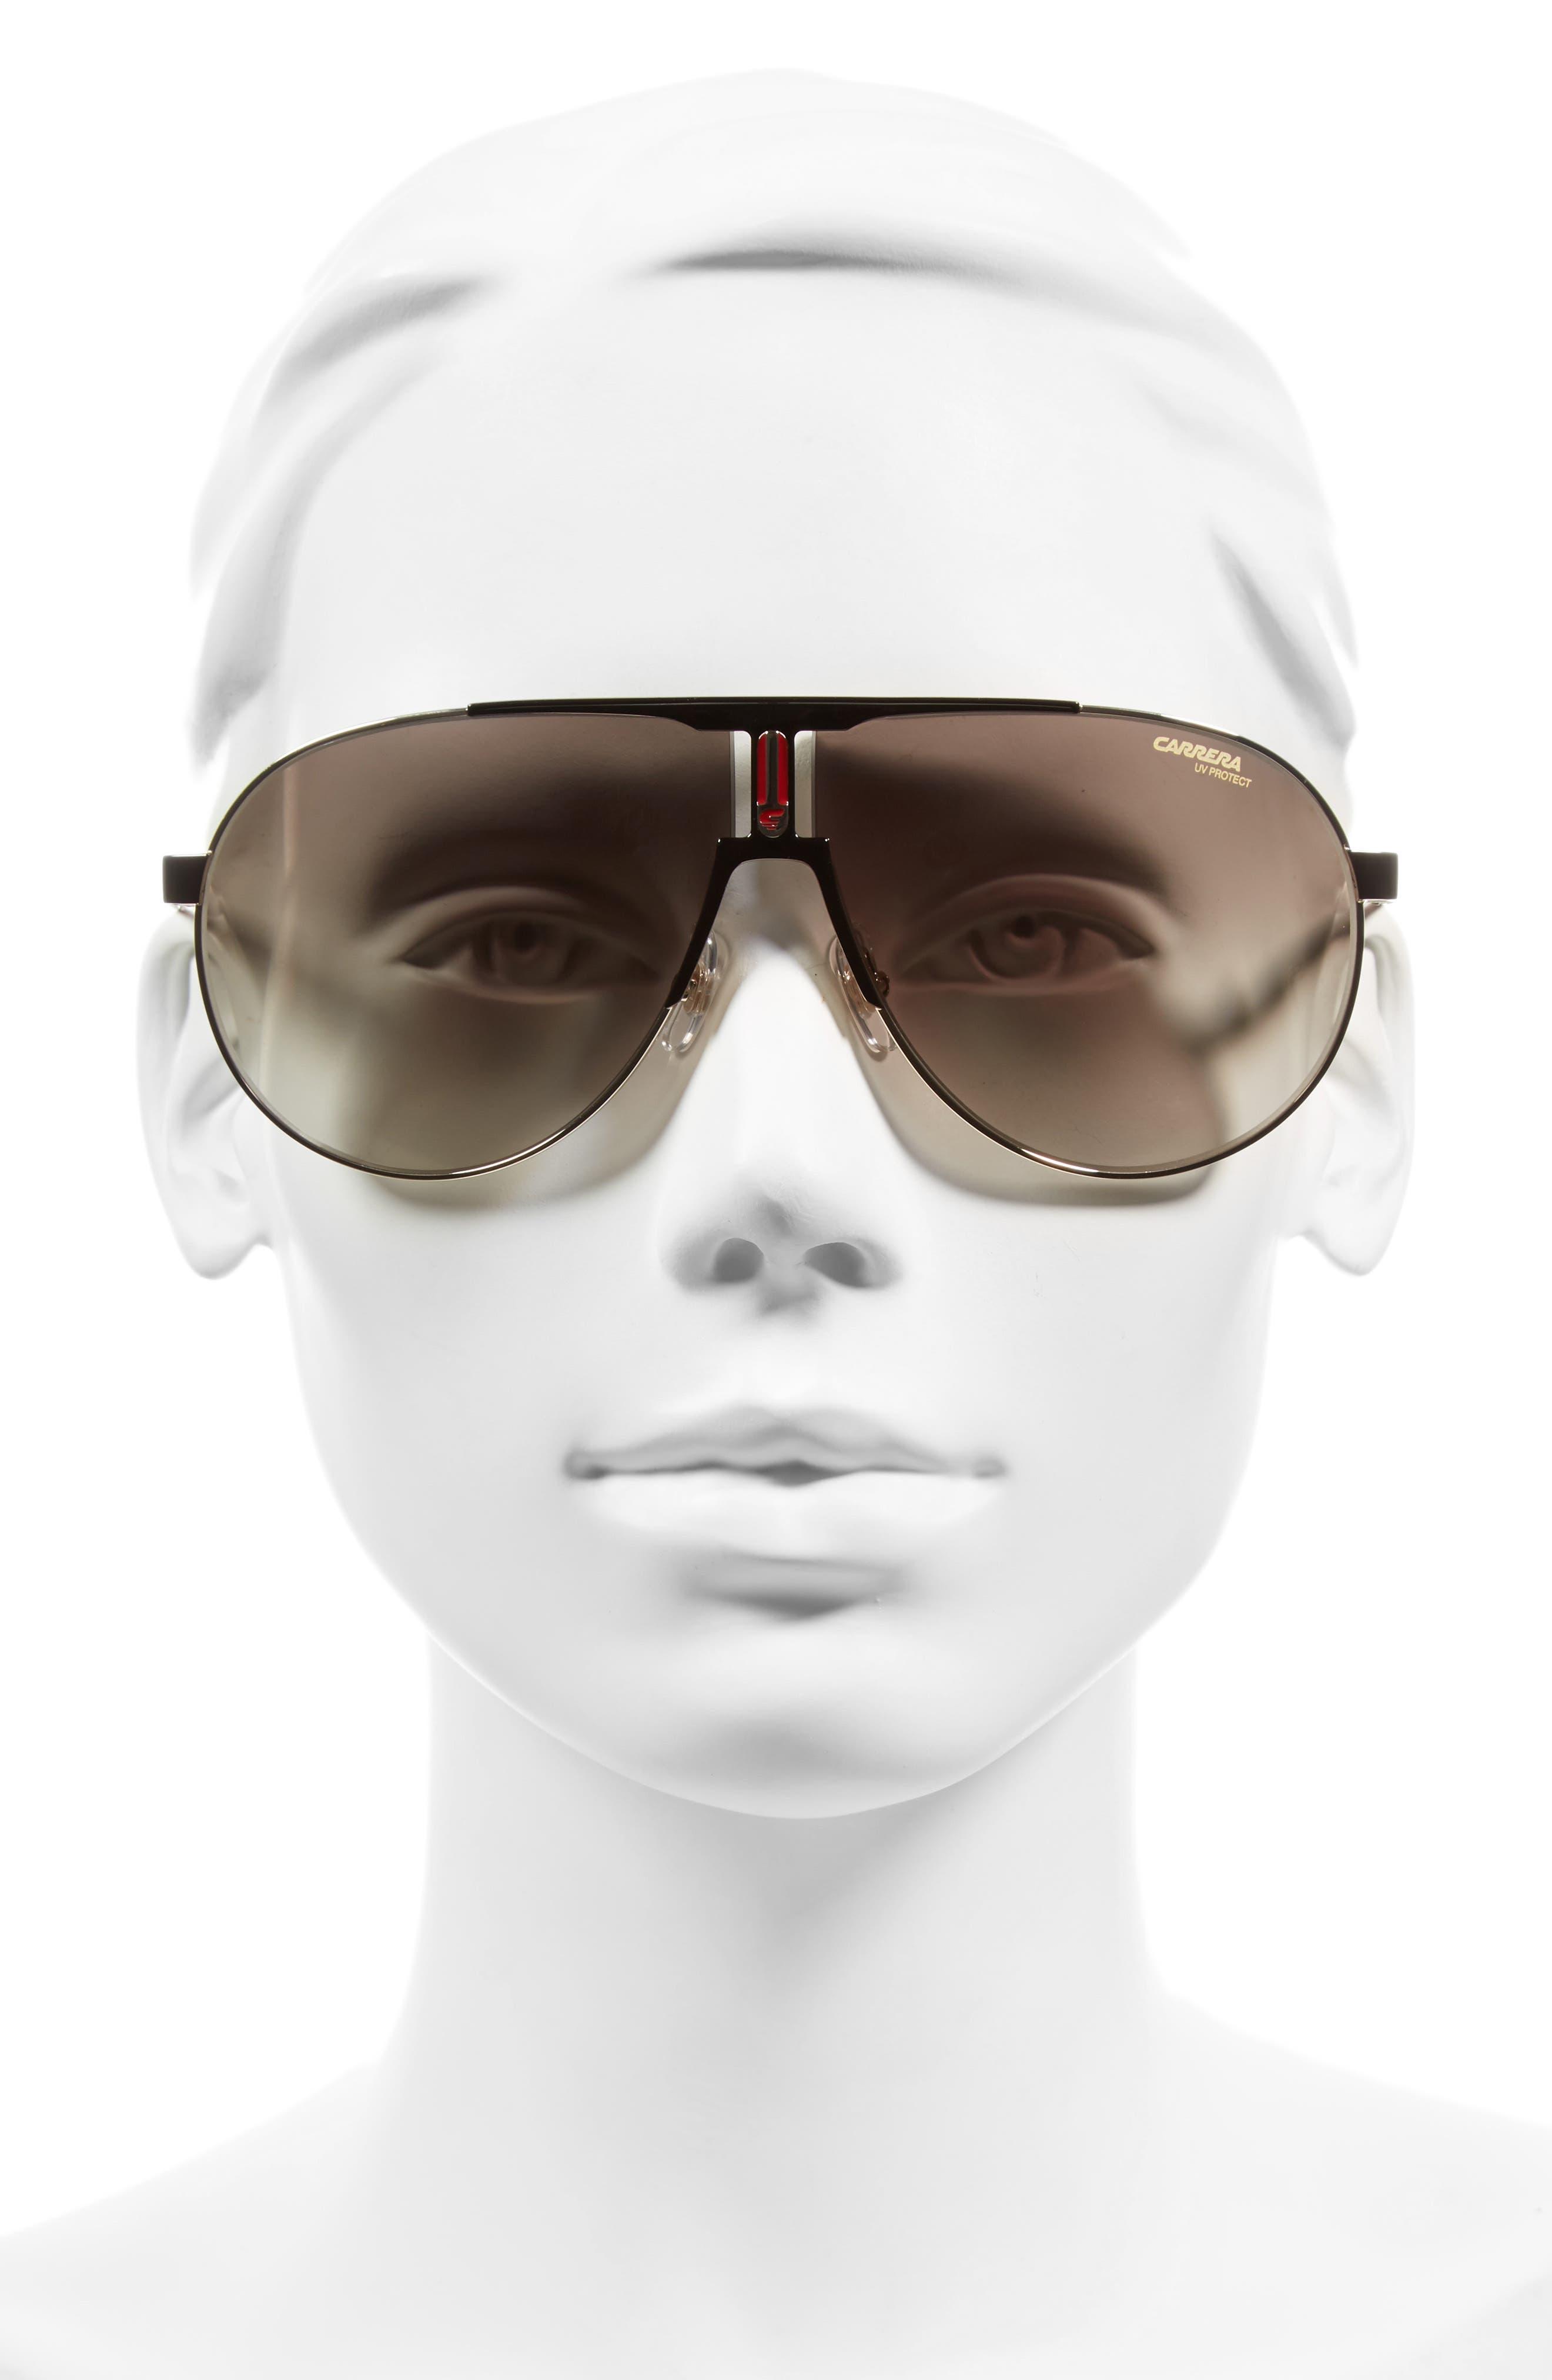 66mm Aviator Sunglasses,                             Alternate thumbnail 3, color,                             001